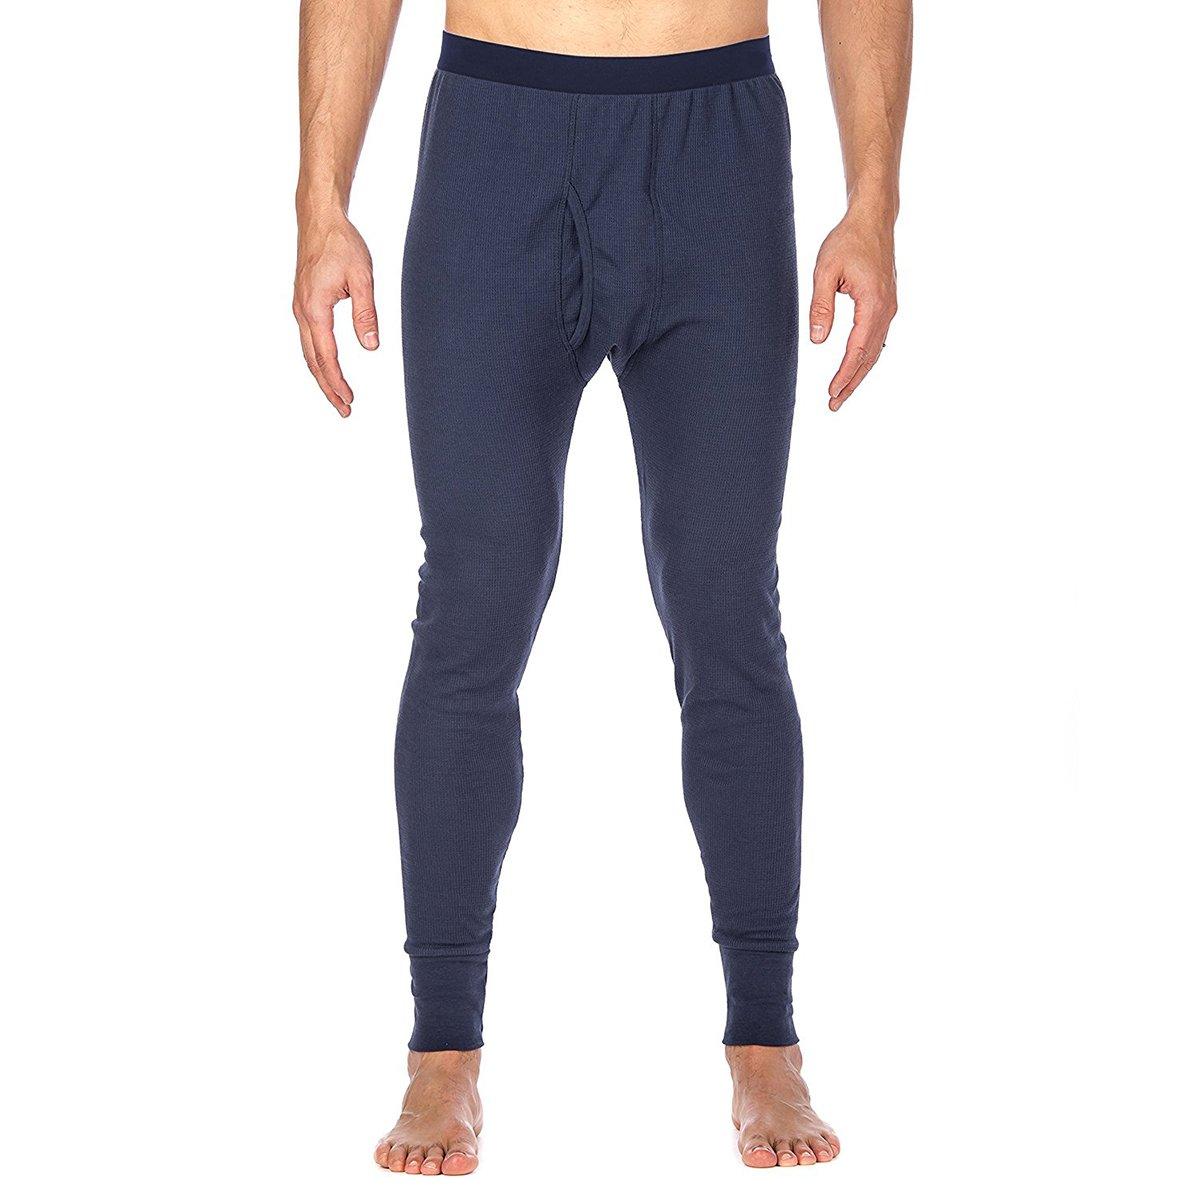 St. John's Bay Men's Thermal Underwear Shirt Or Pant Light Base Layer Long Johns